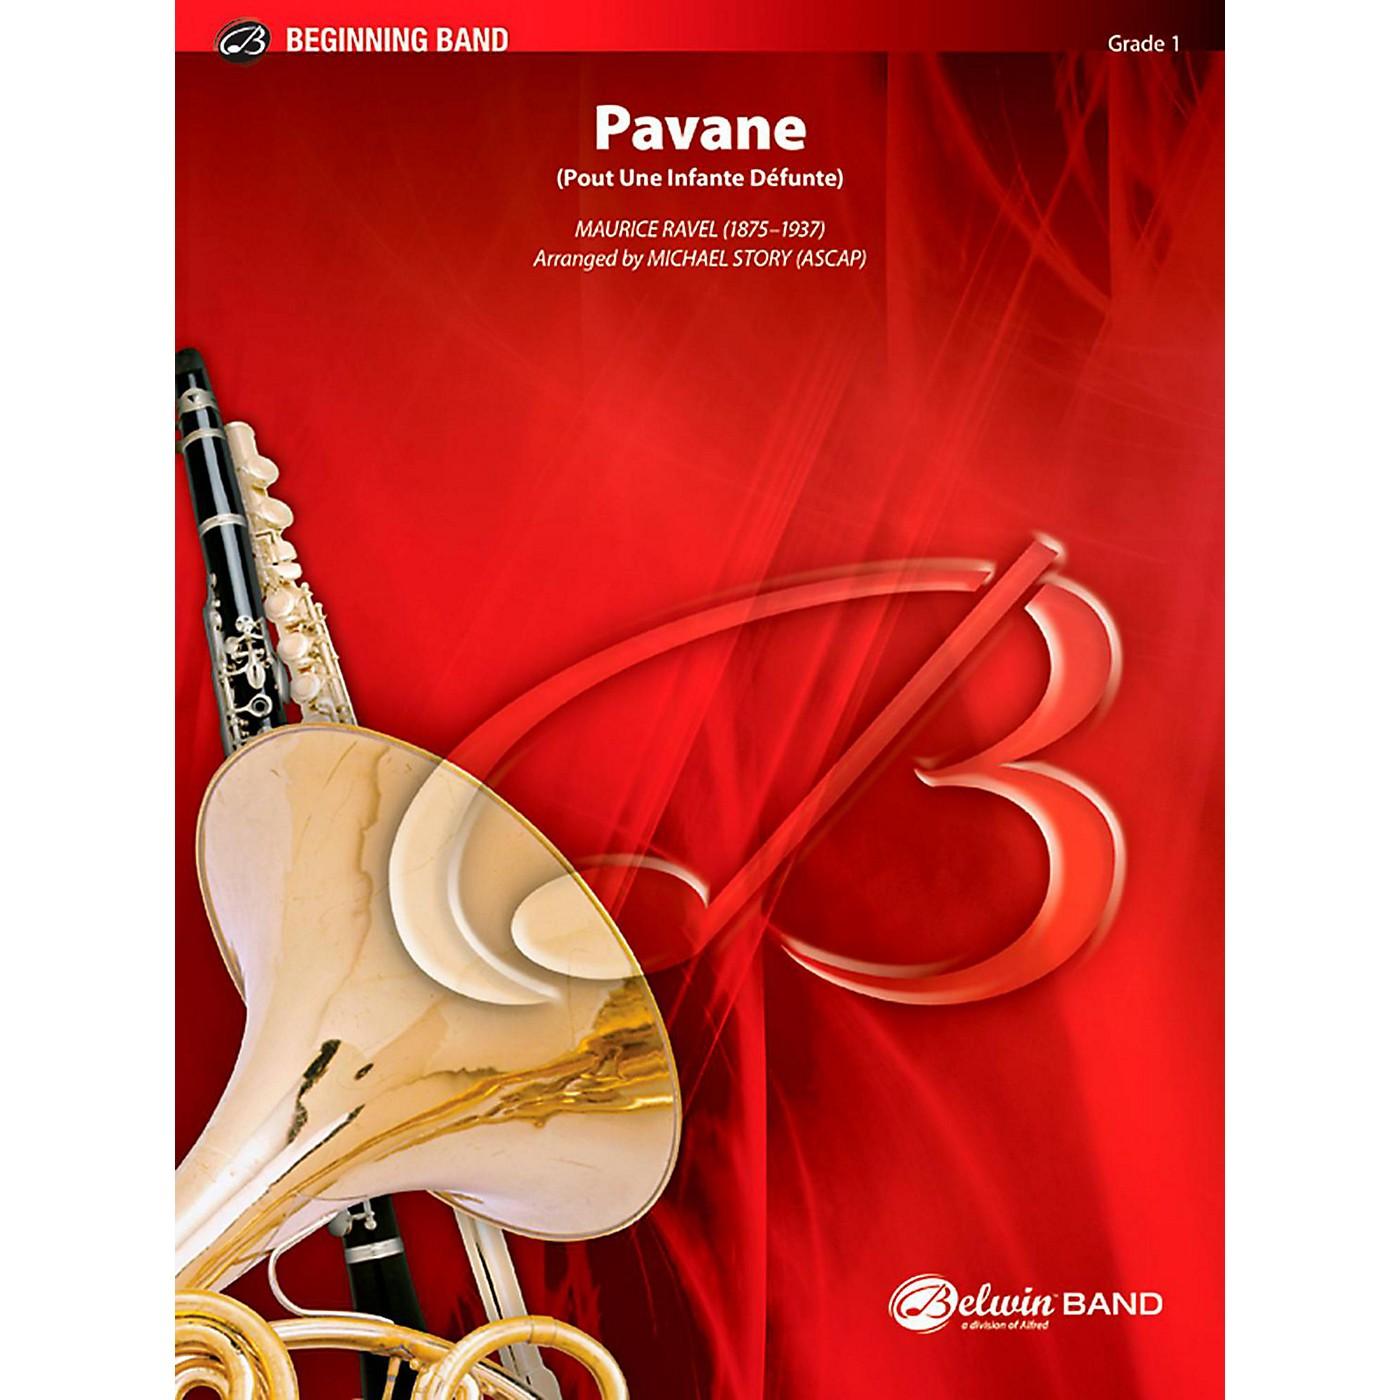 BELWIN Pavane Concert Band Grade 1 (Very Easy) thumbnail